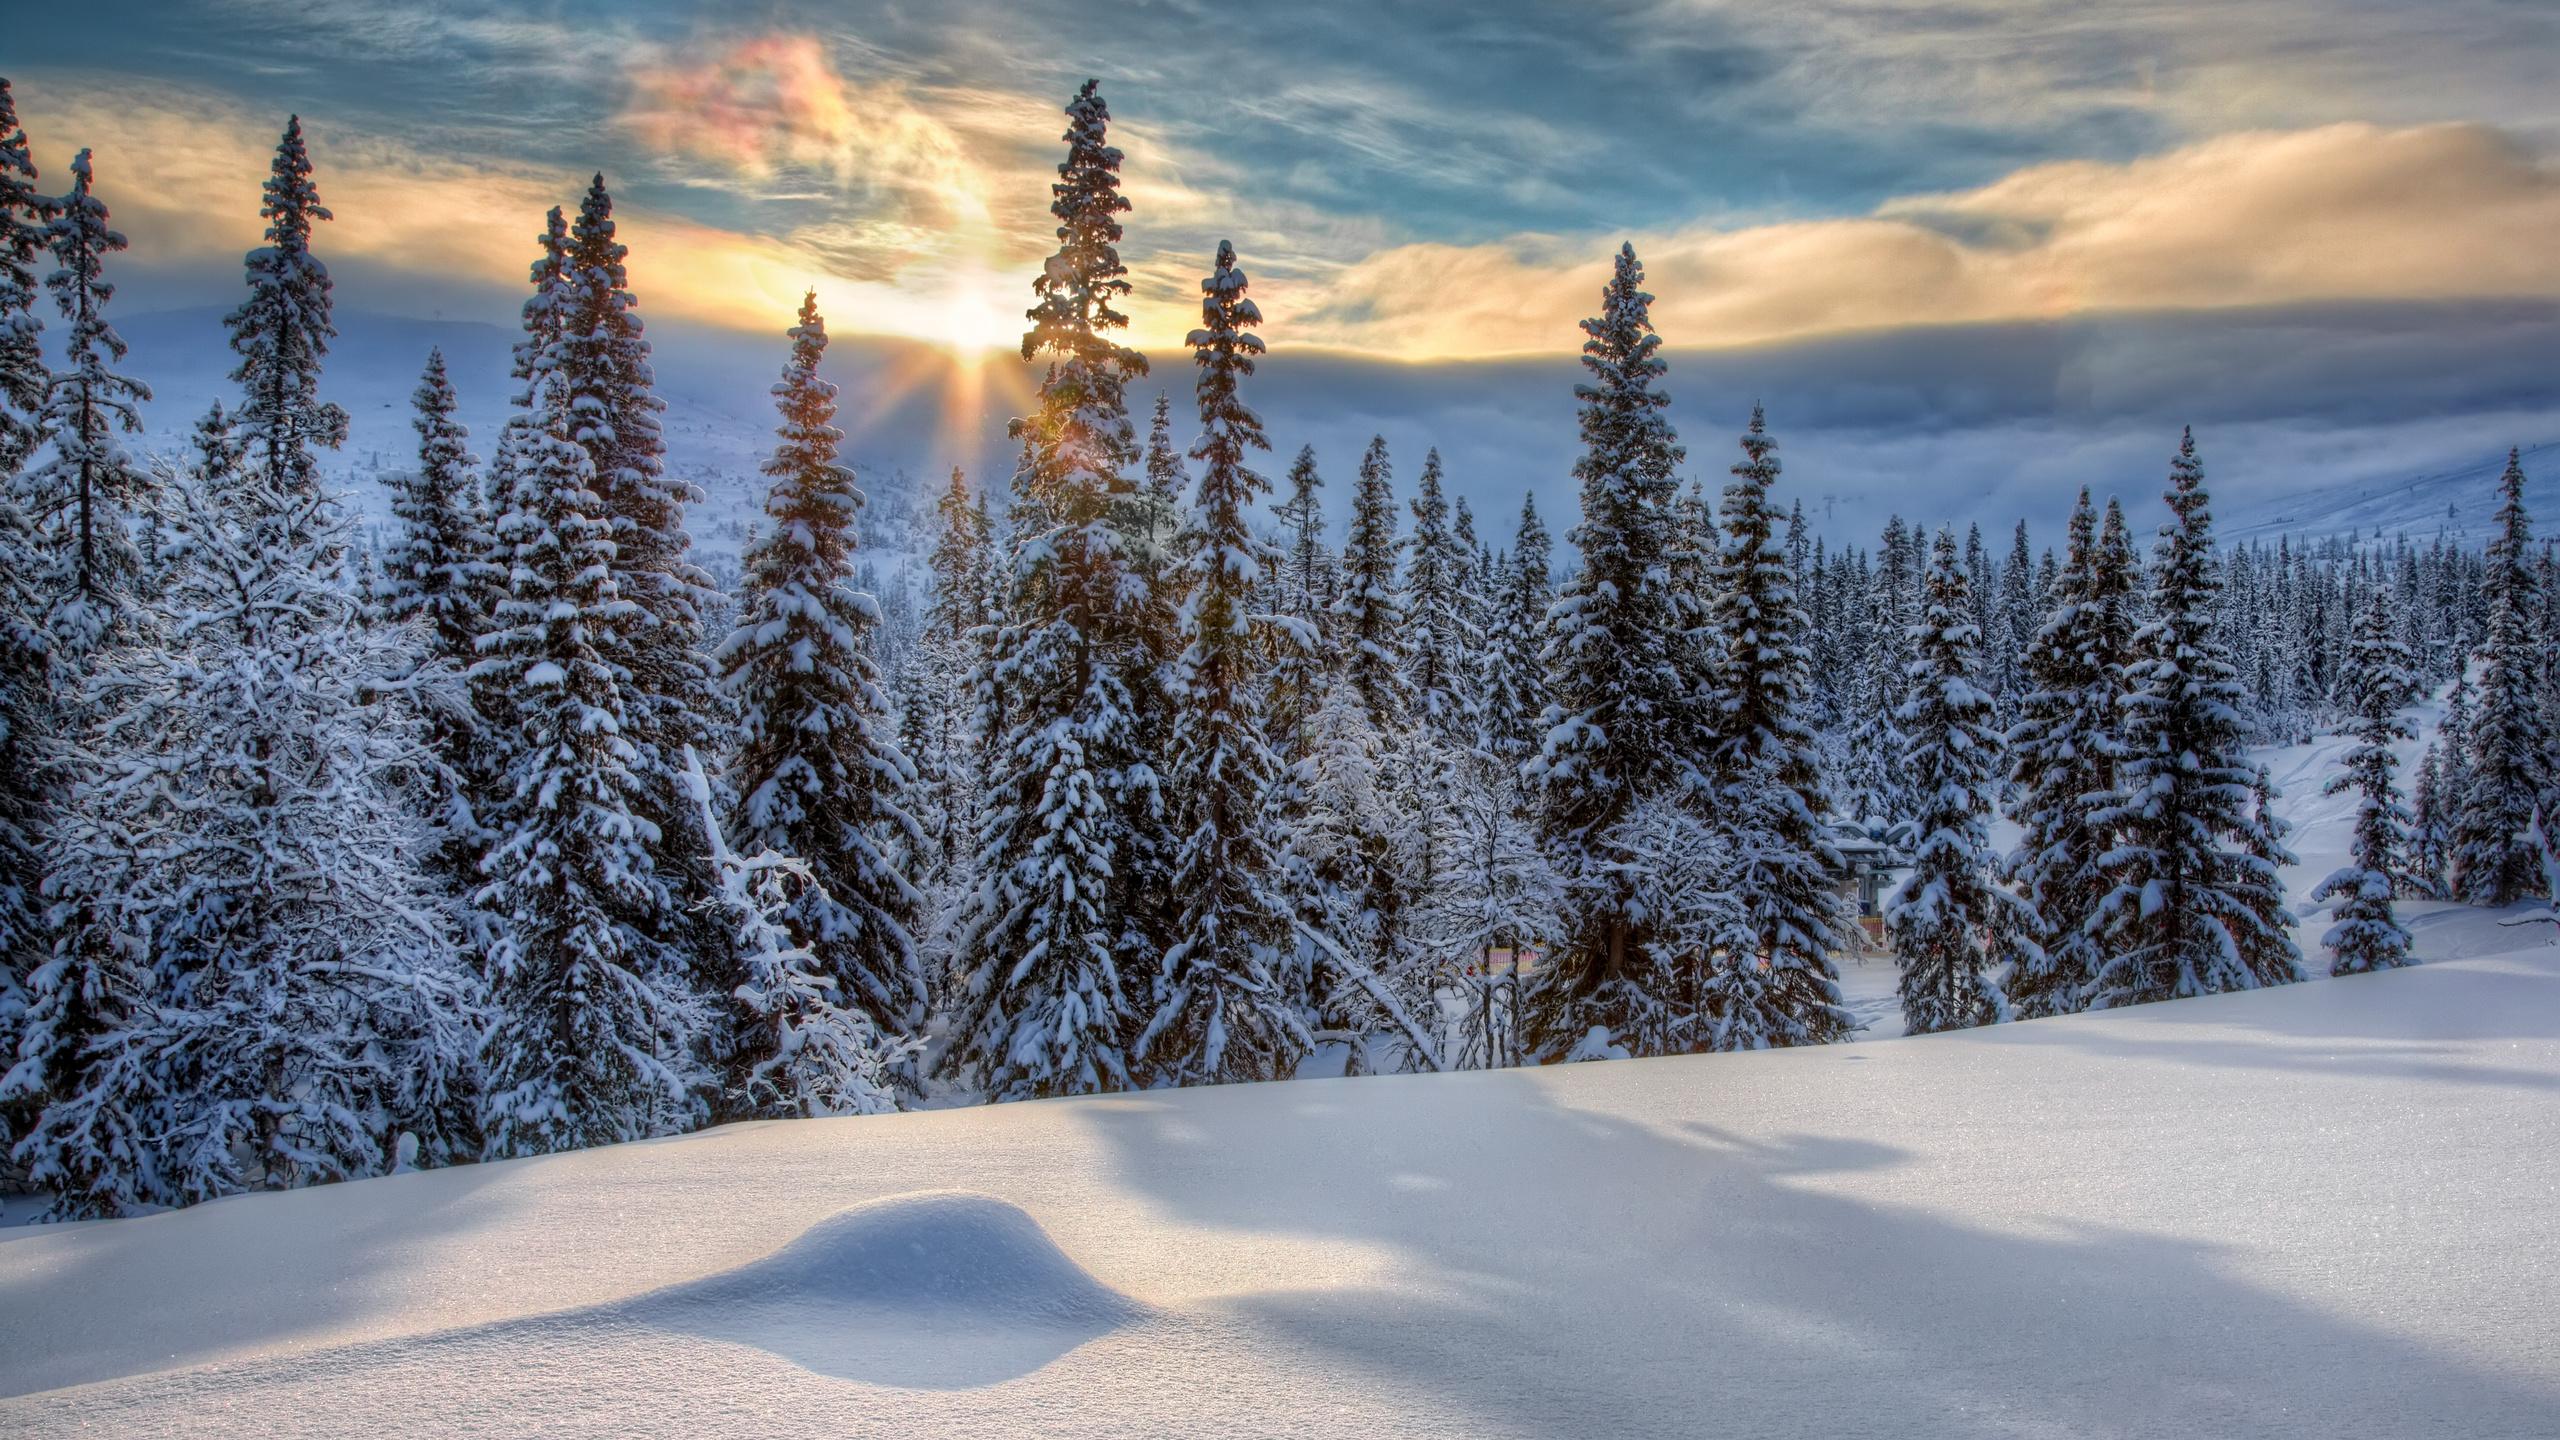 картинки зеленые ели зима снег закат барселоне можно найти